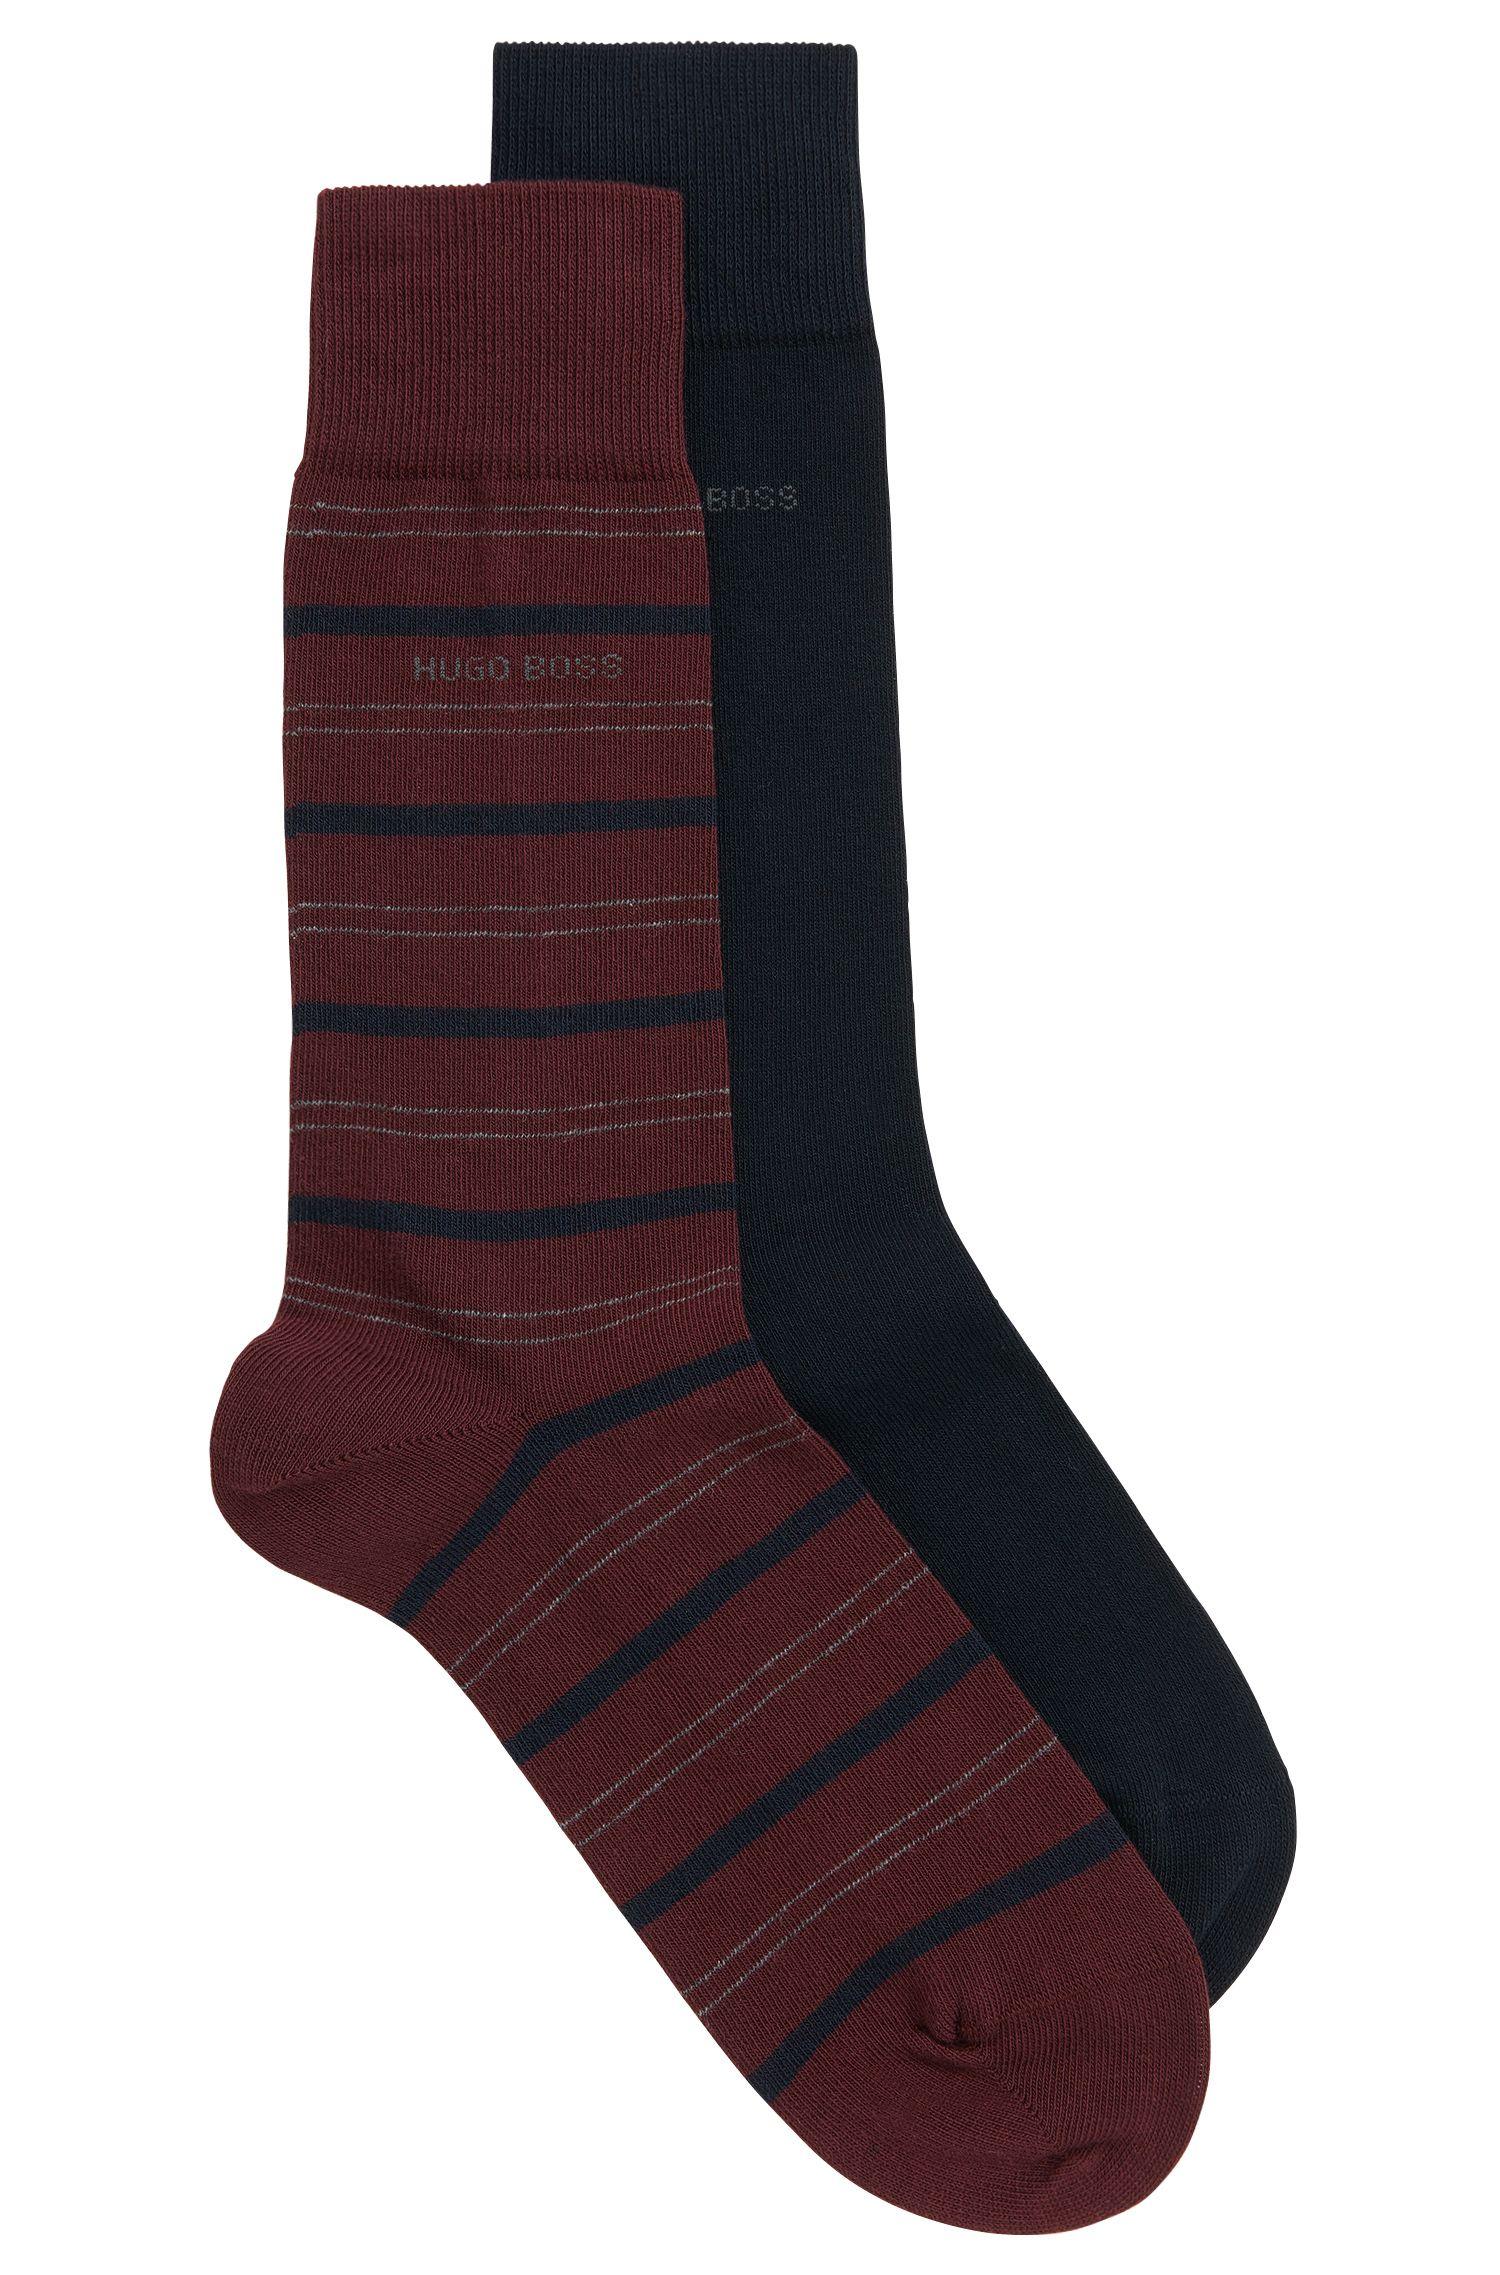 Zweier-Pack mittelhohe Socken aus gekämmtem Baumwoll-Mix mit Elasthan